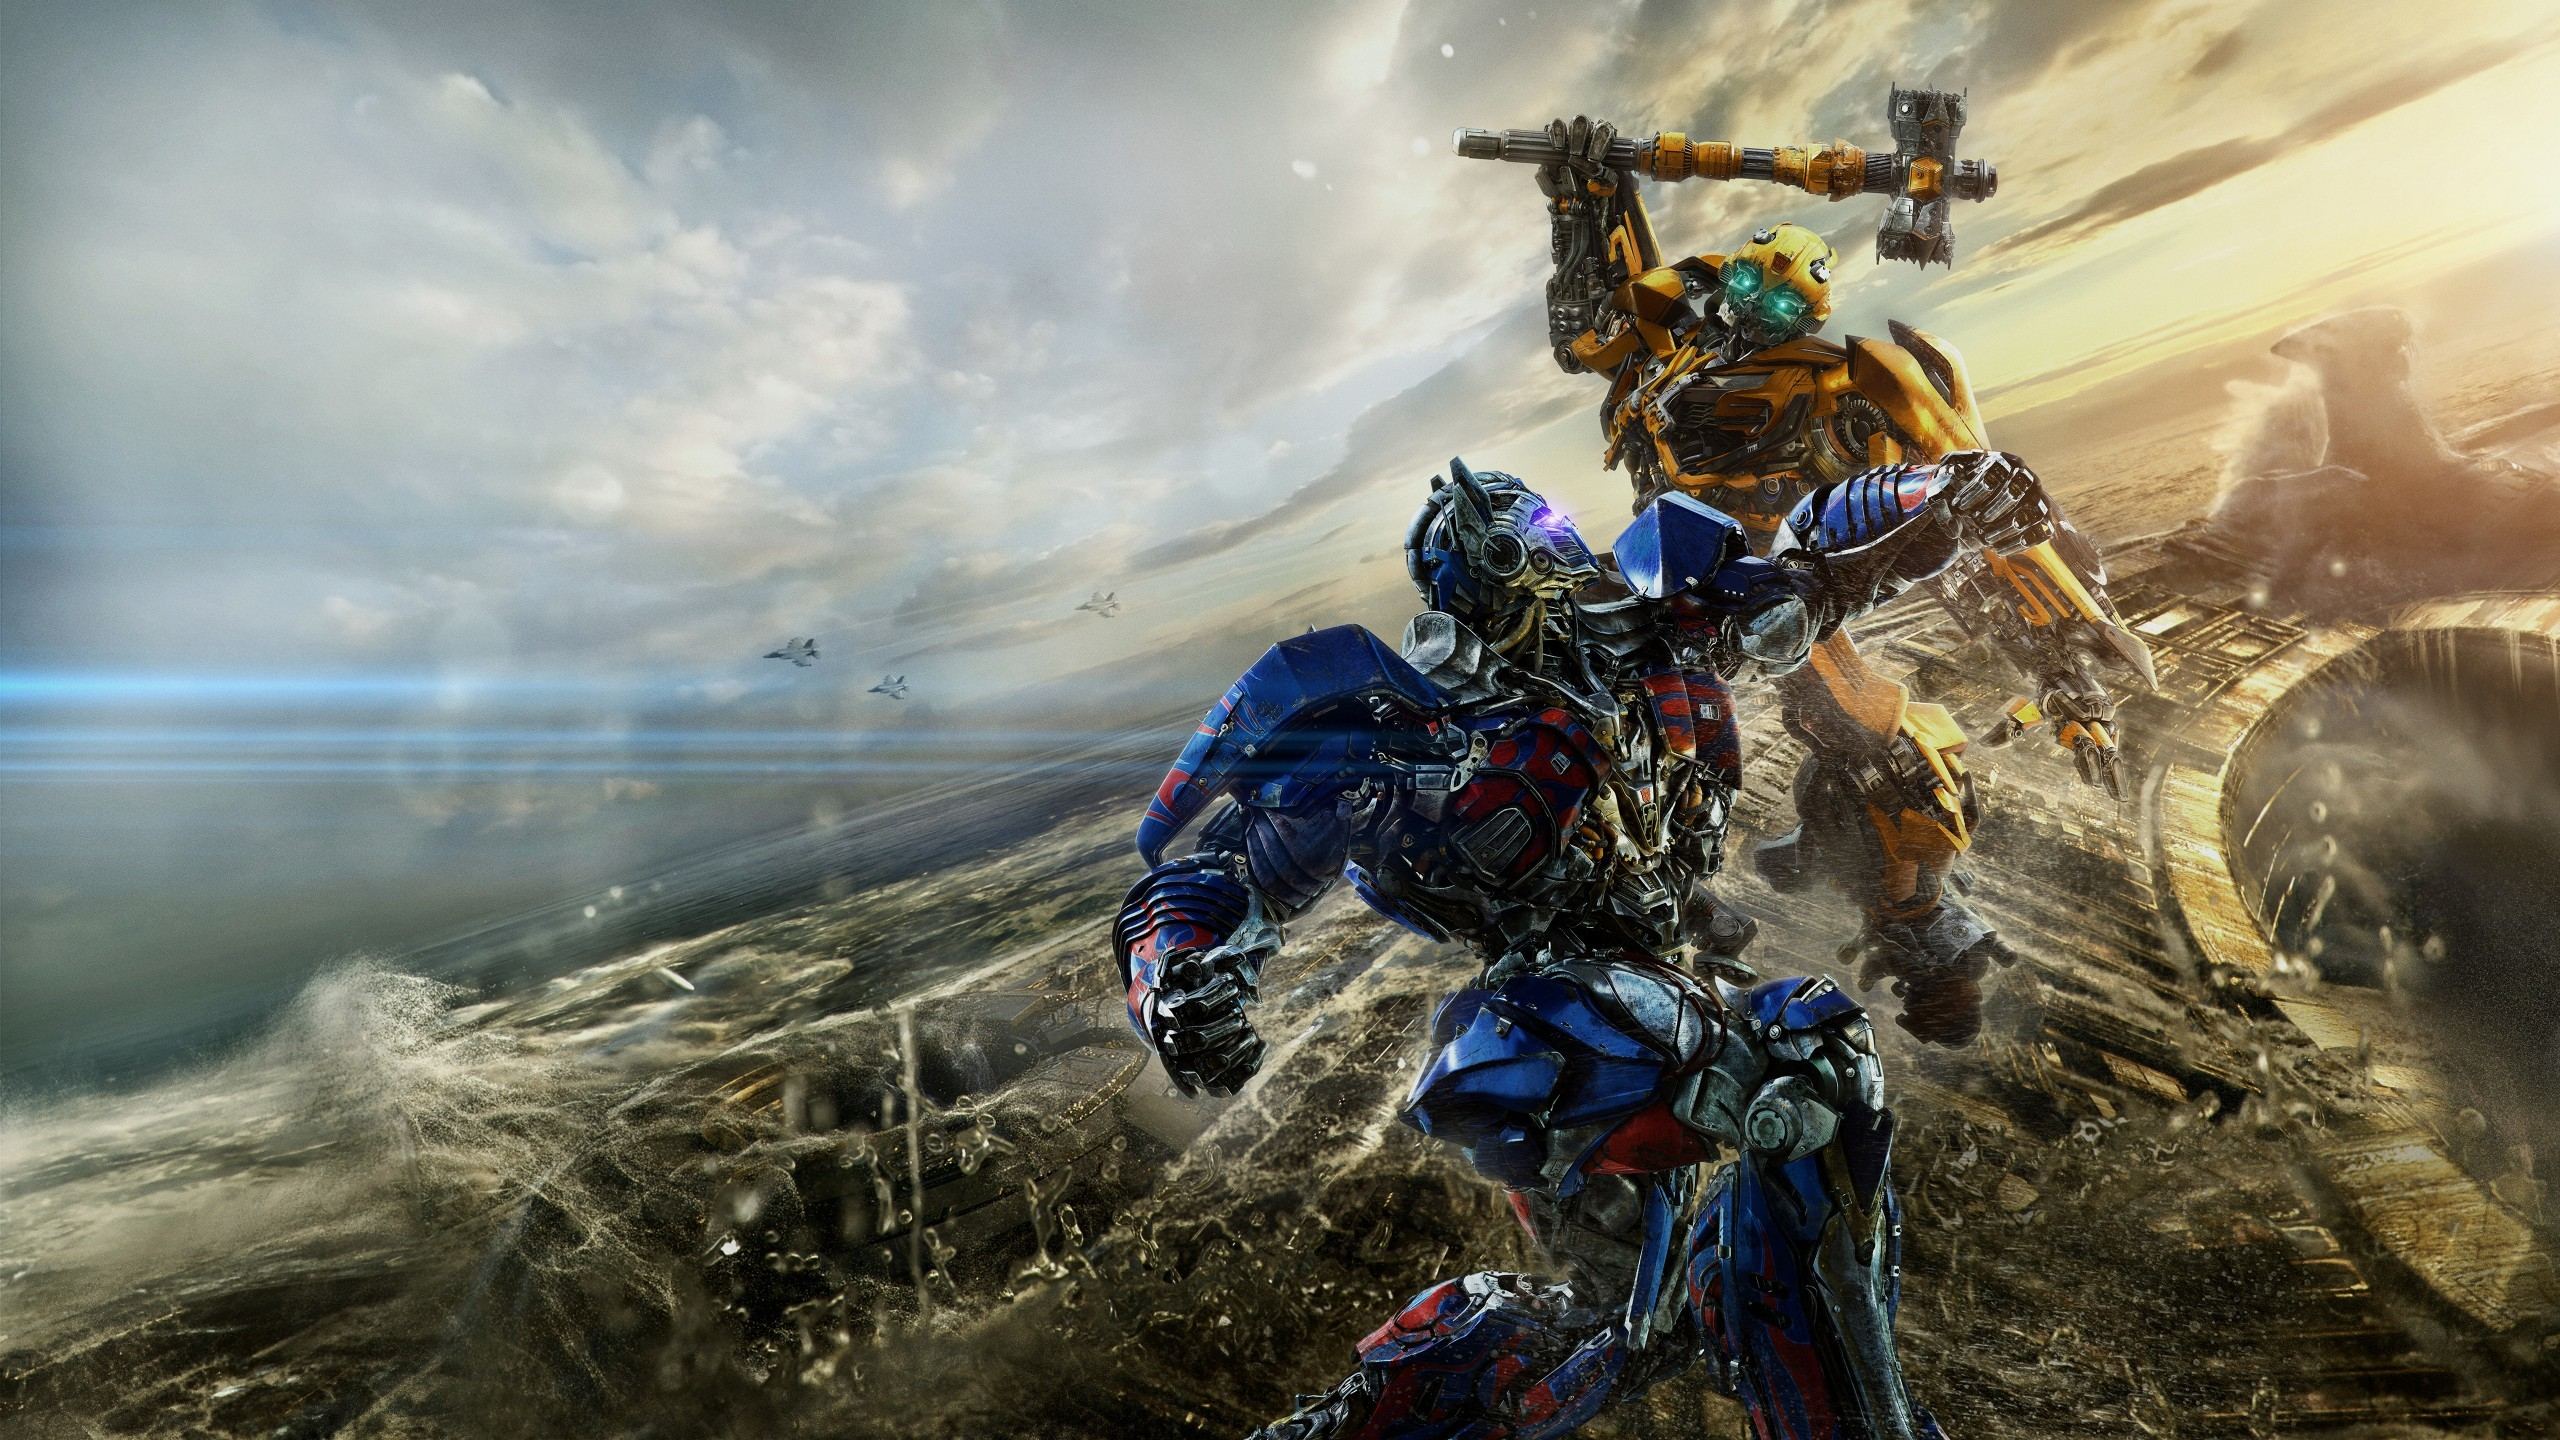 Bumblebee vs Optimus Prime in Transformers the Last Knight HD Wallpaper